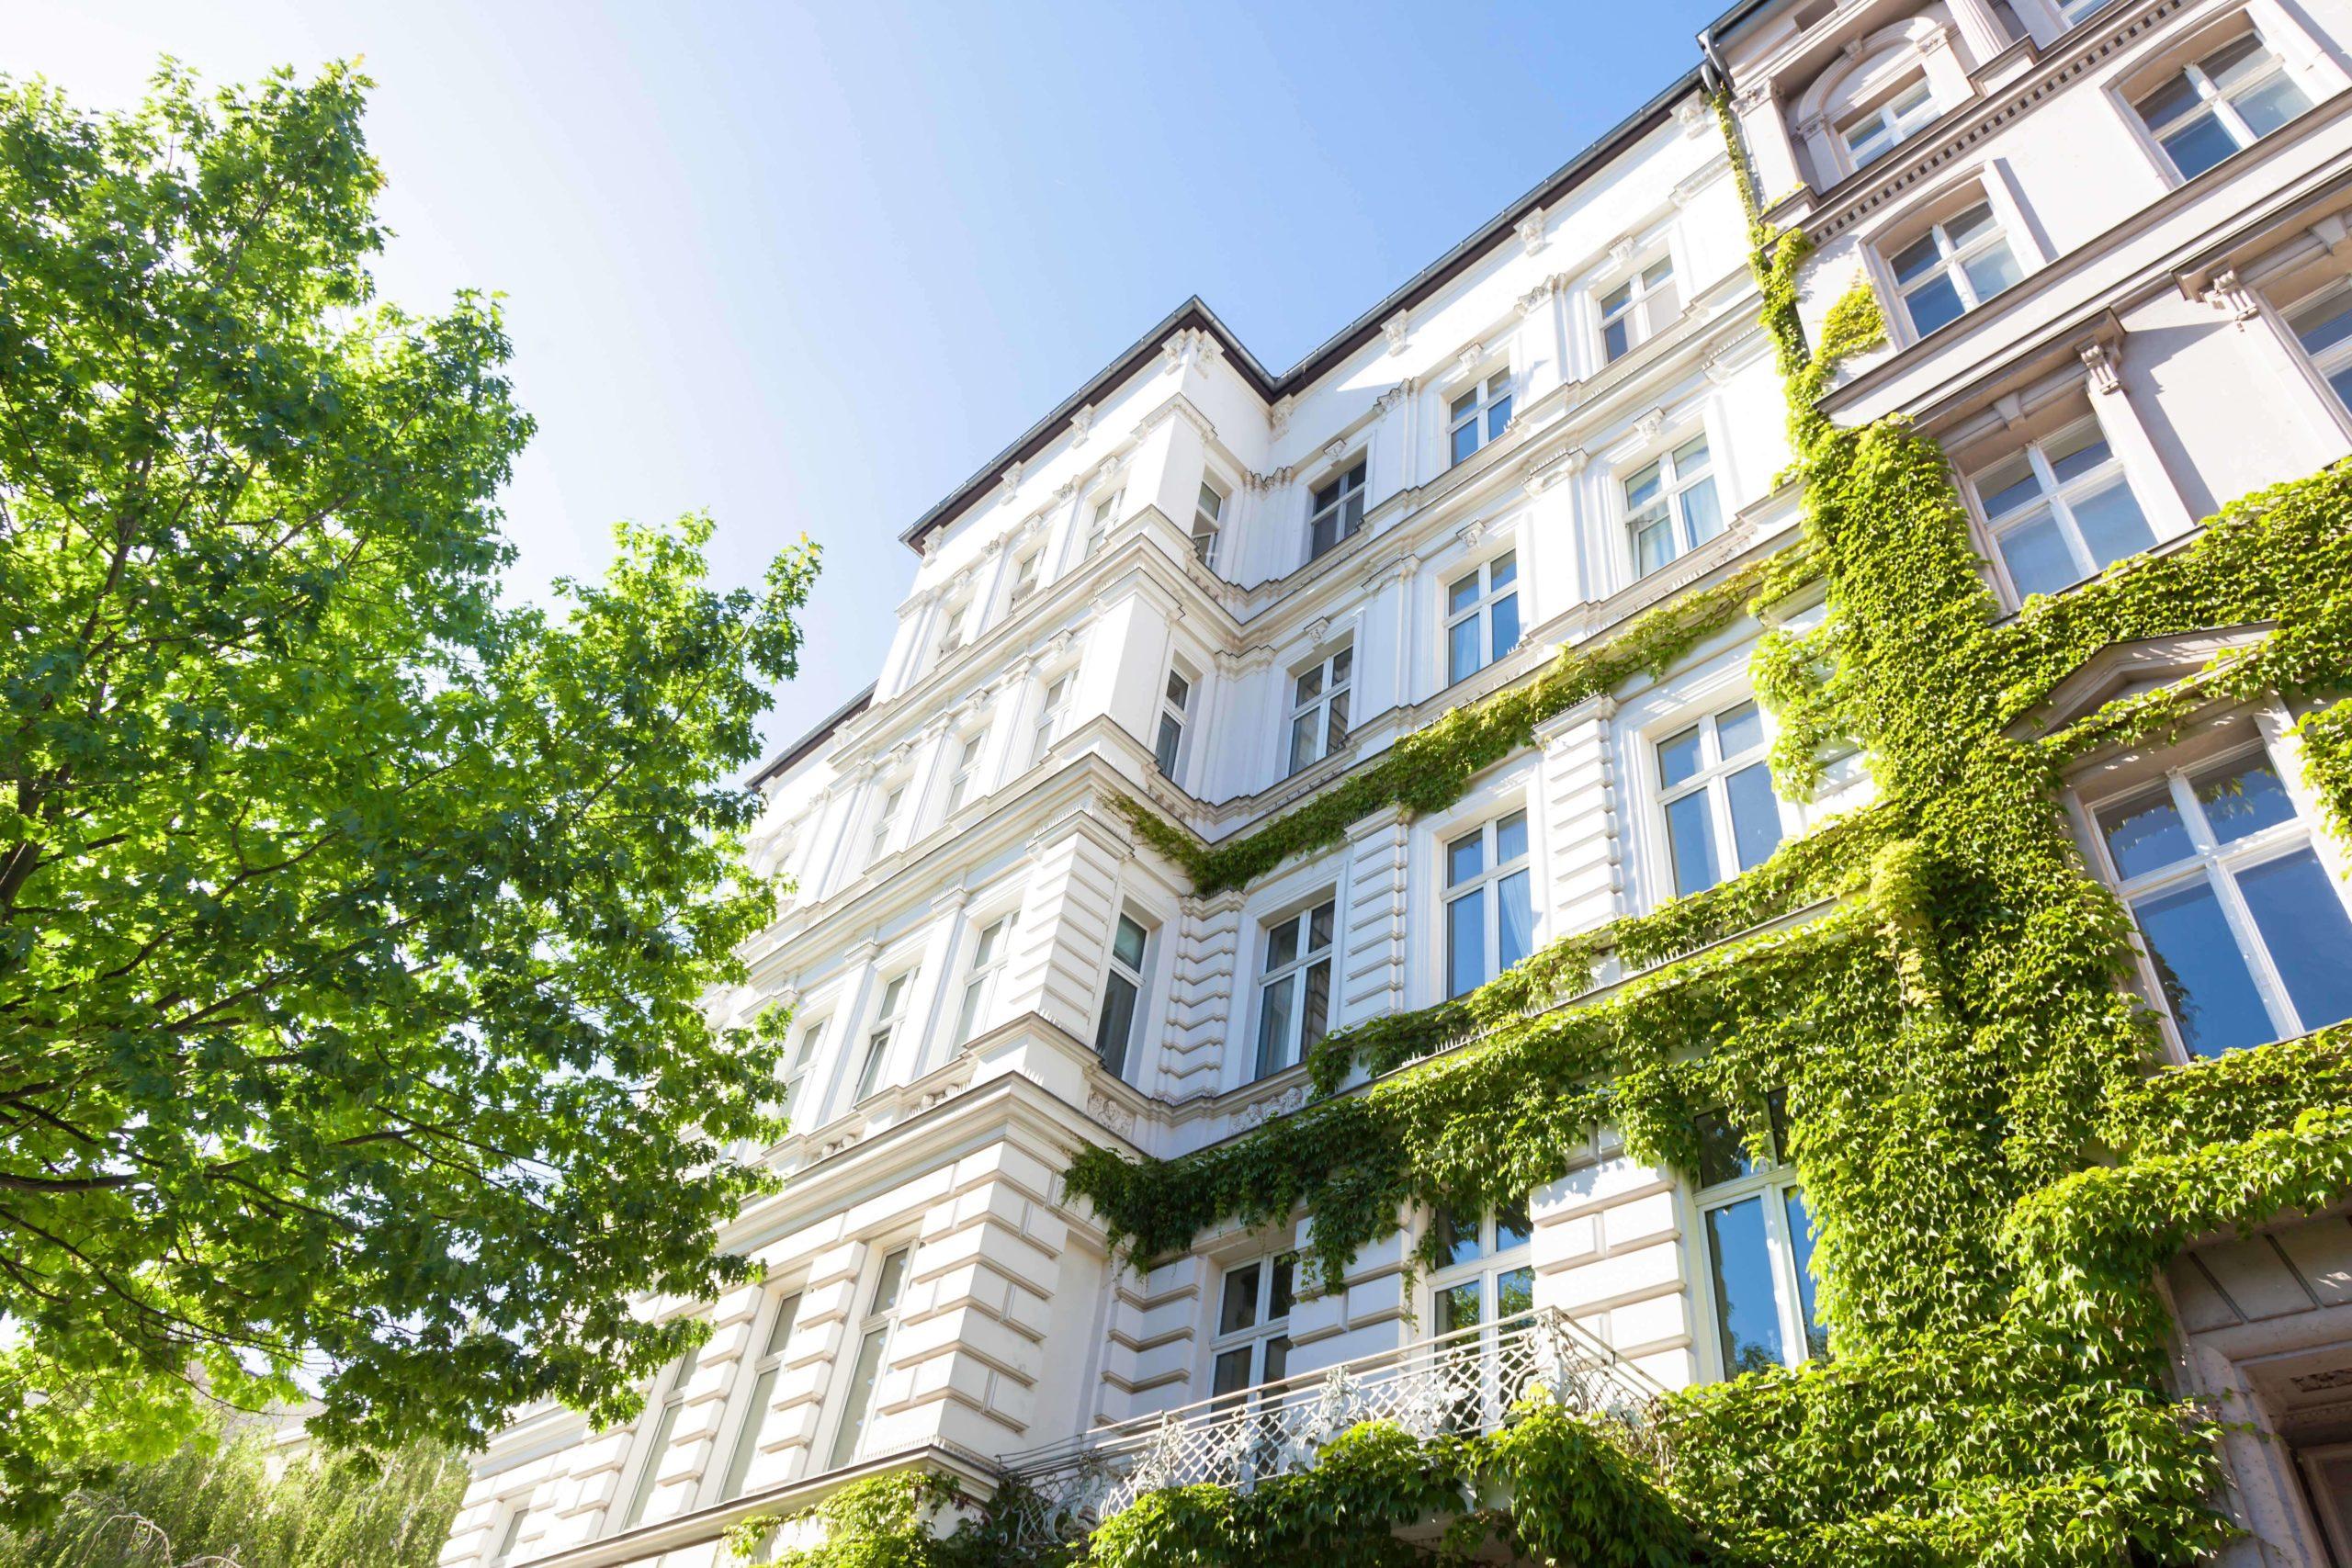 Denkmalschutz Immobilie